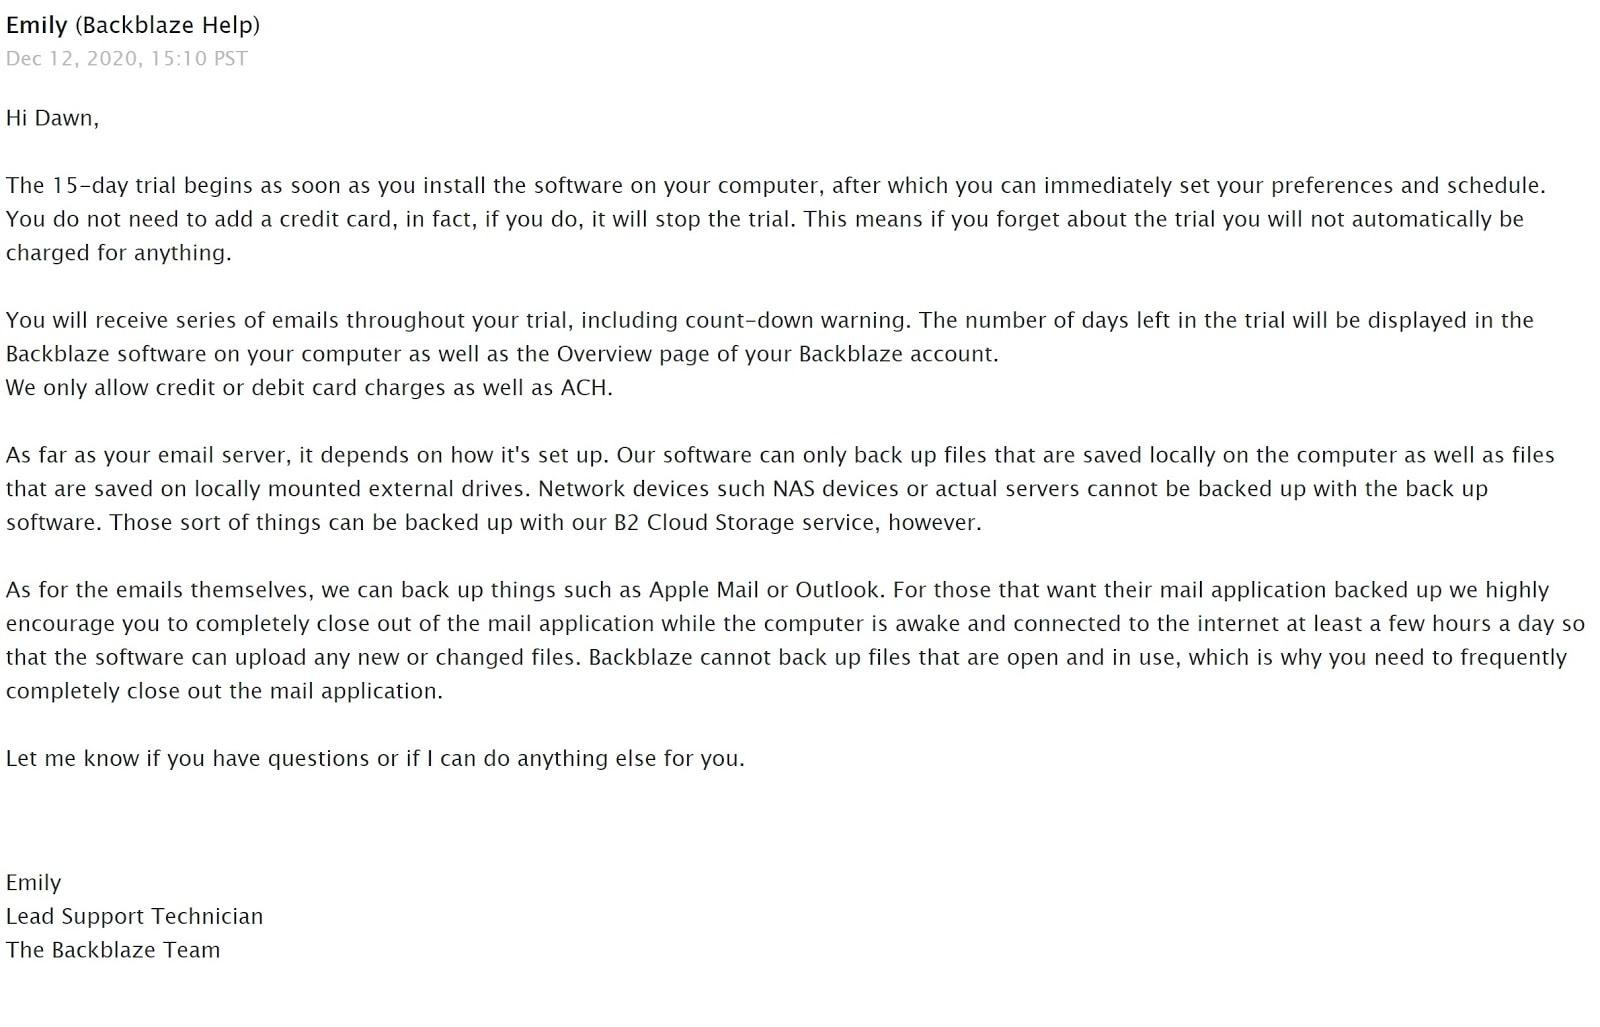 Backblaze email support response